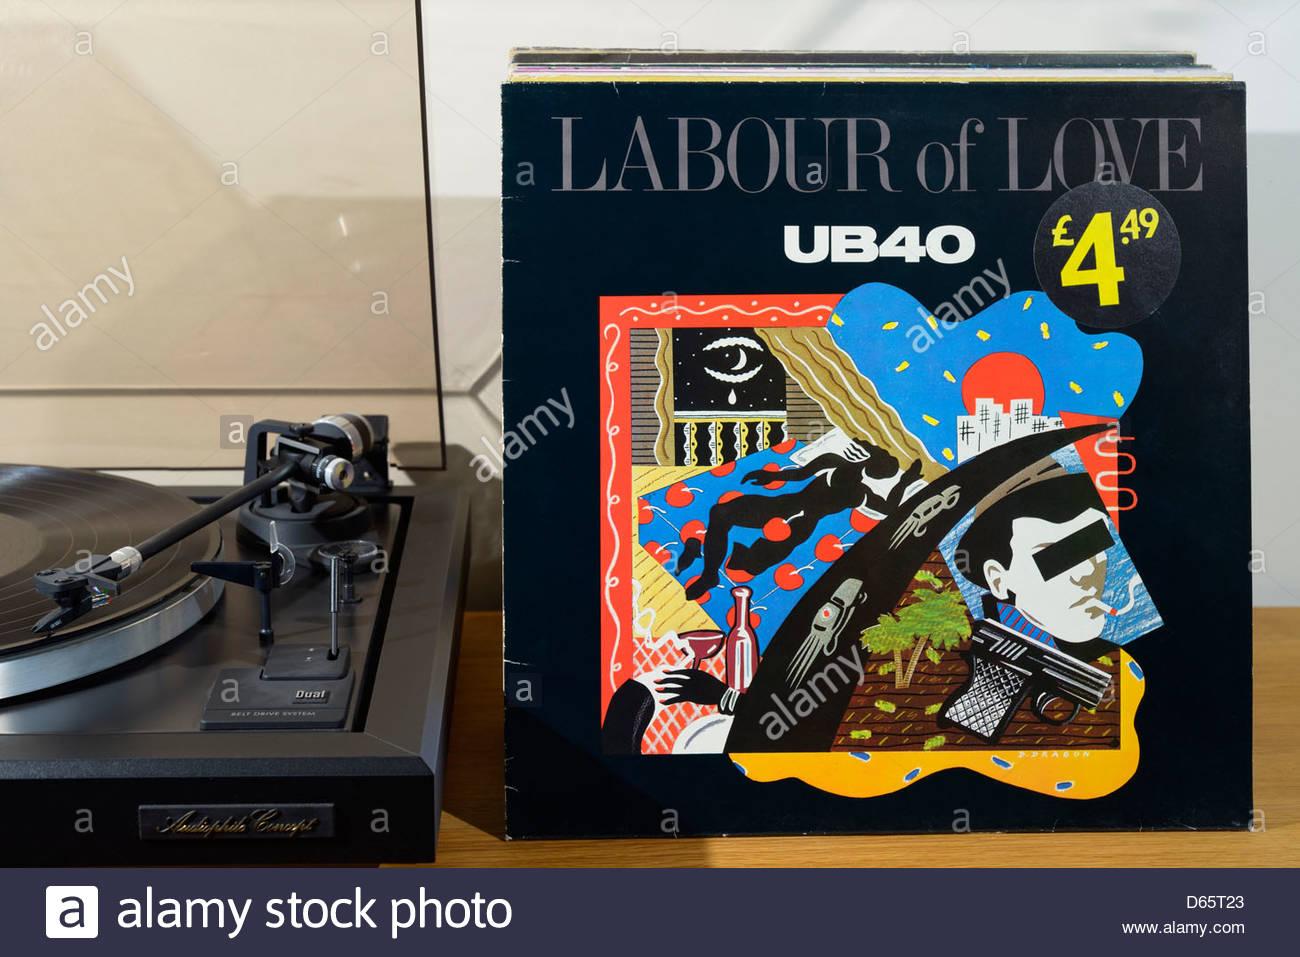 Ub40 Stock Photos & Ub40 Stock Images - Alamy